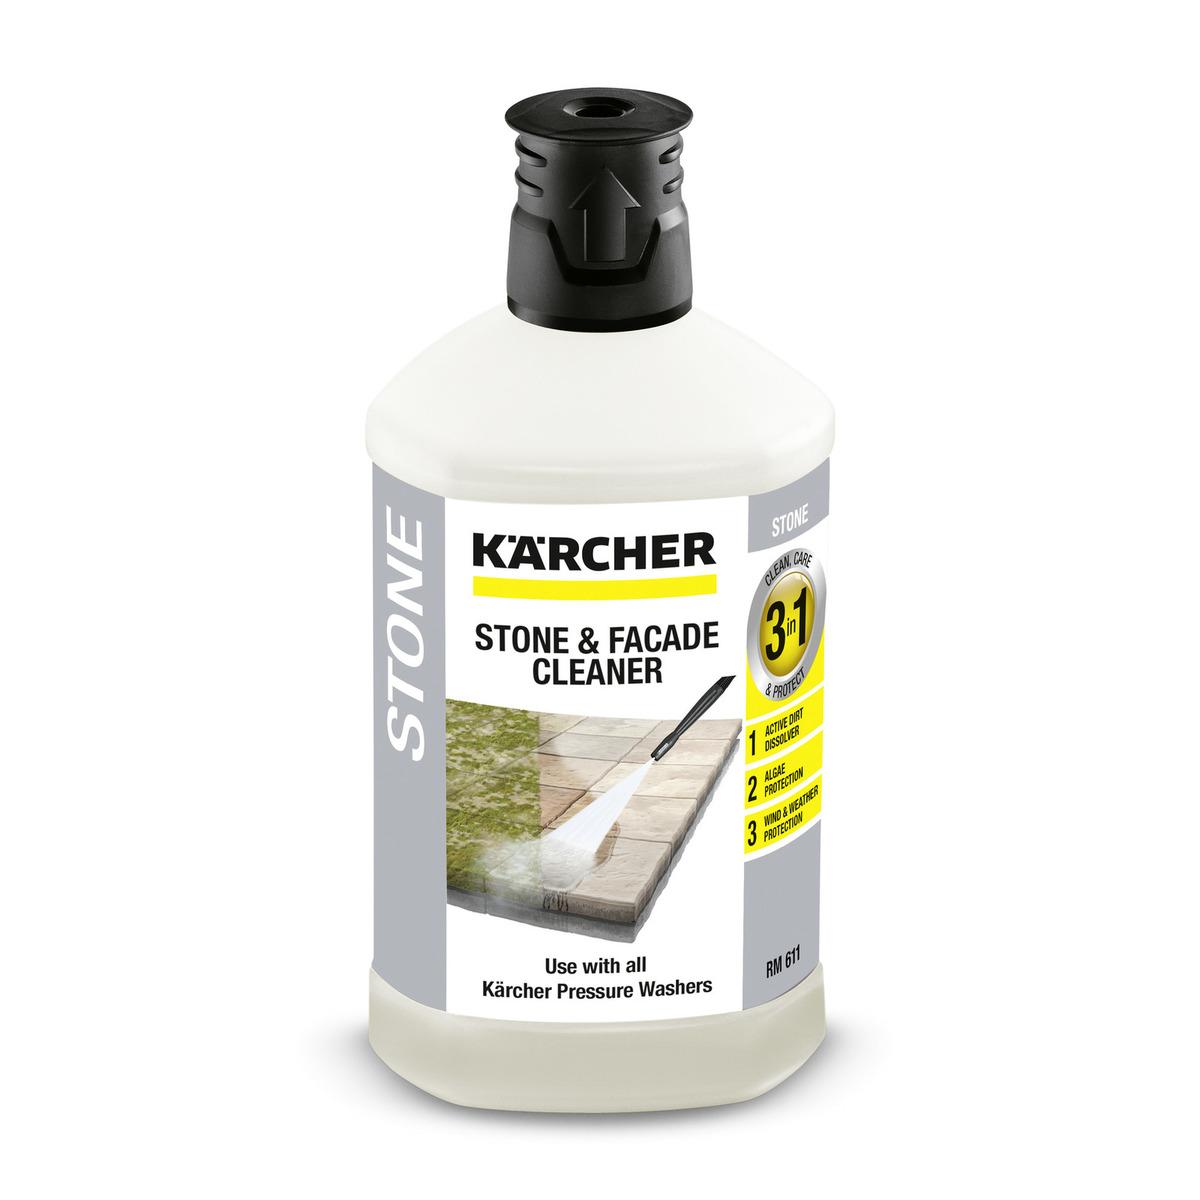 Karcher Stone cleaner